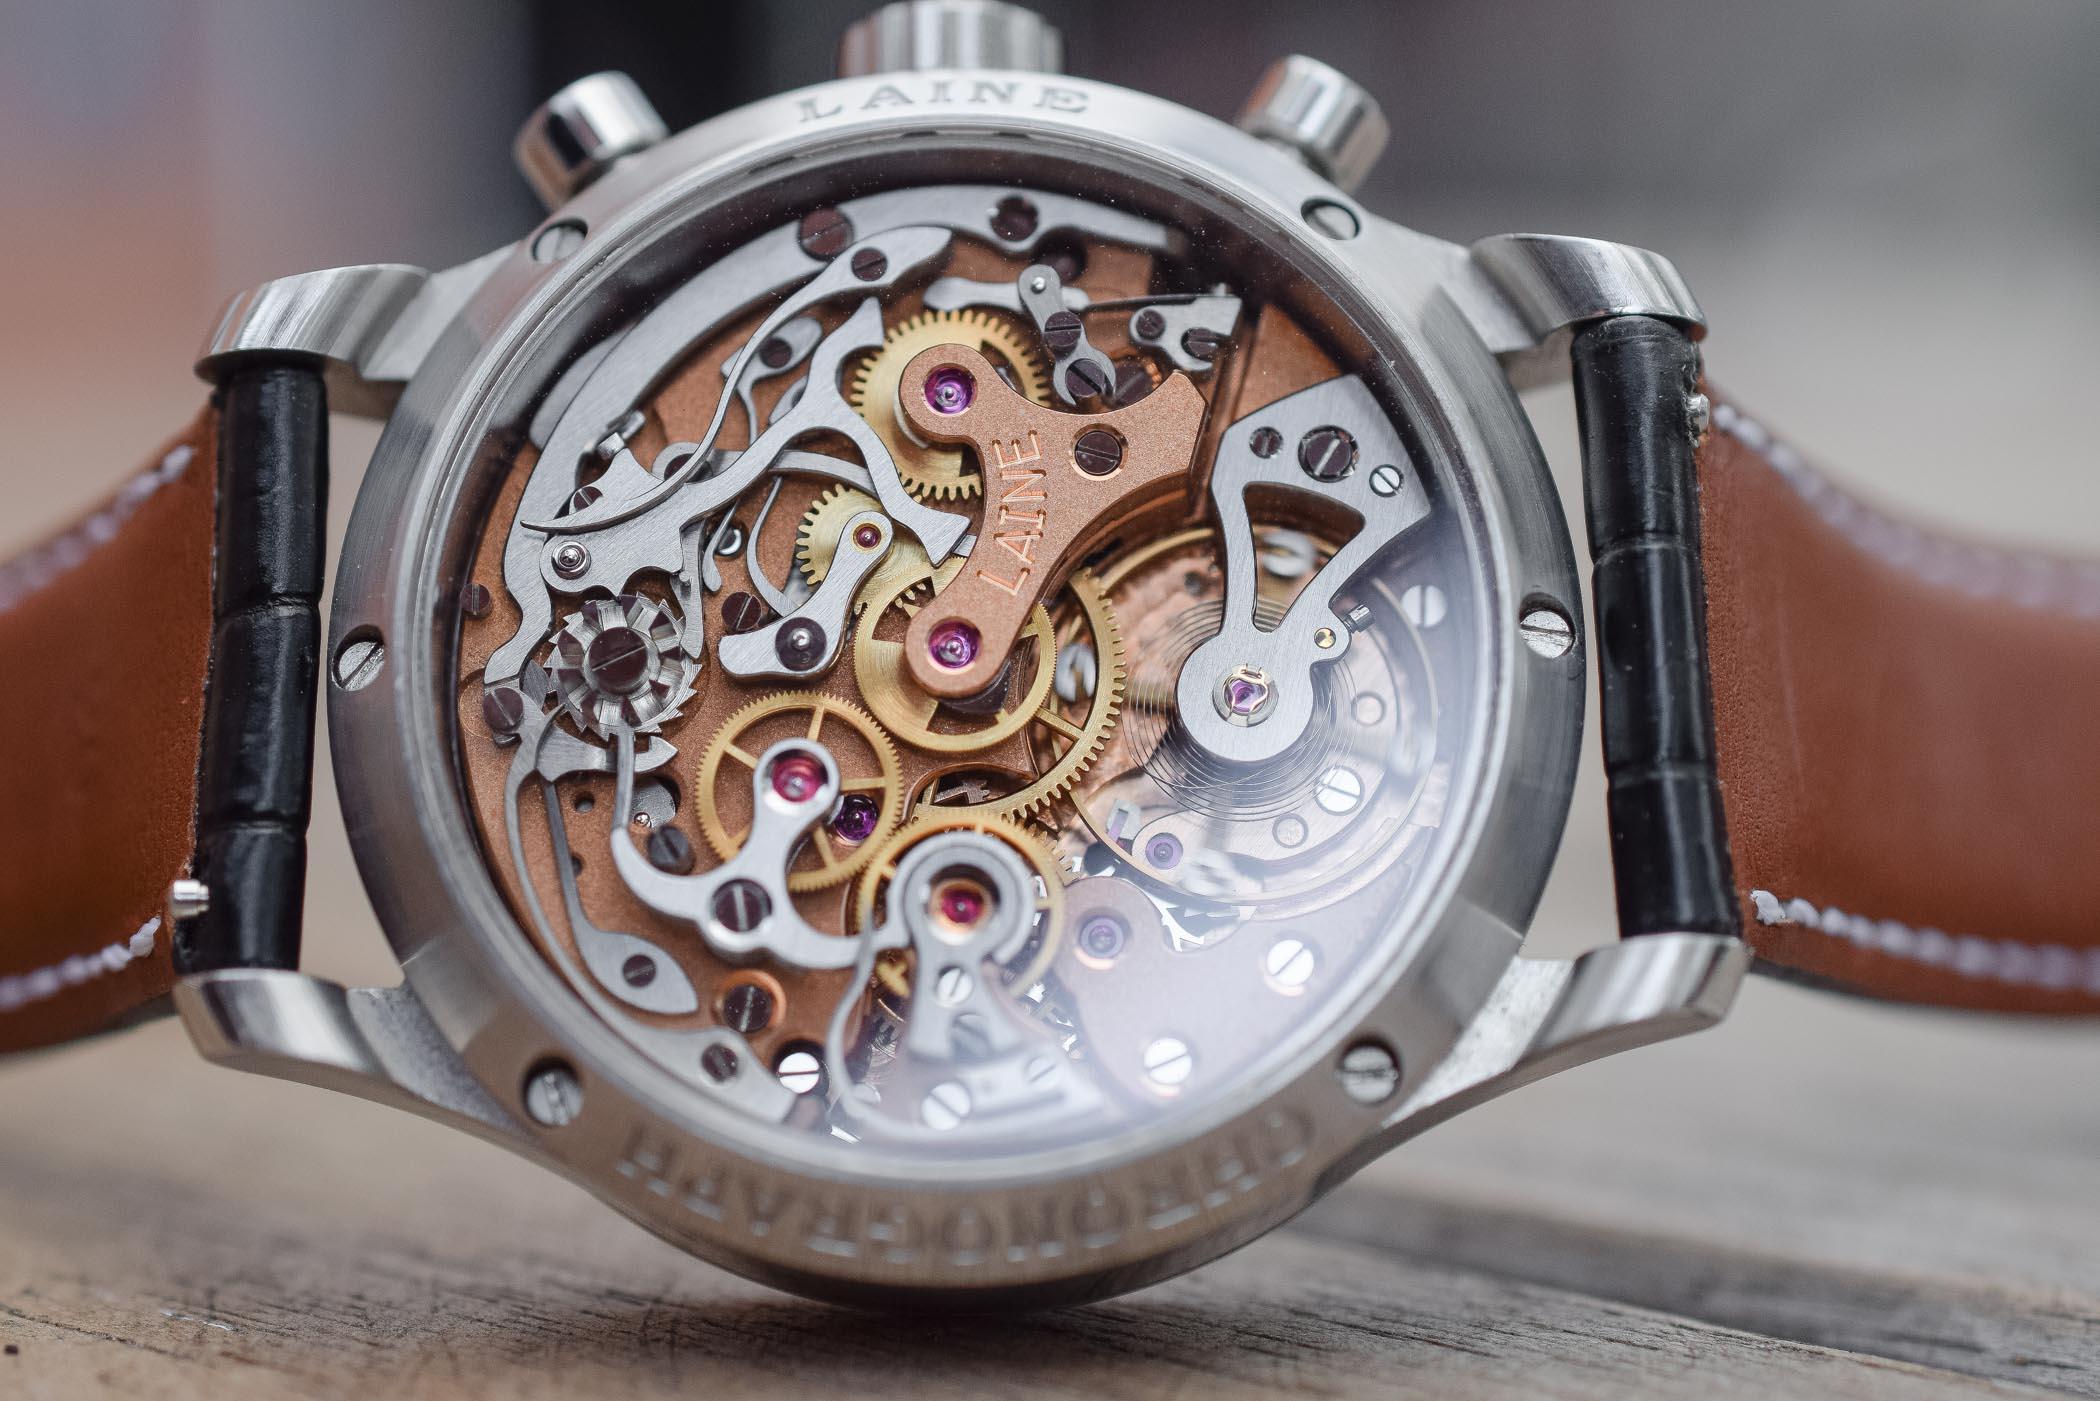 Laine Classic Chronograph Valjoux 22